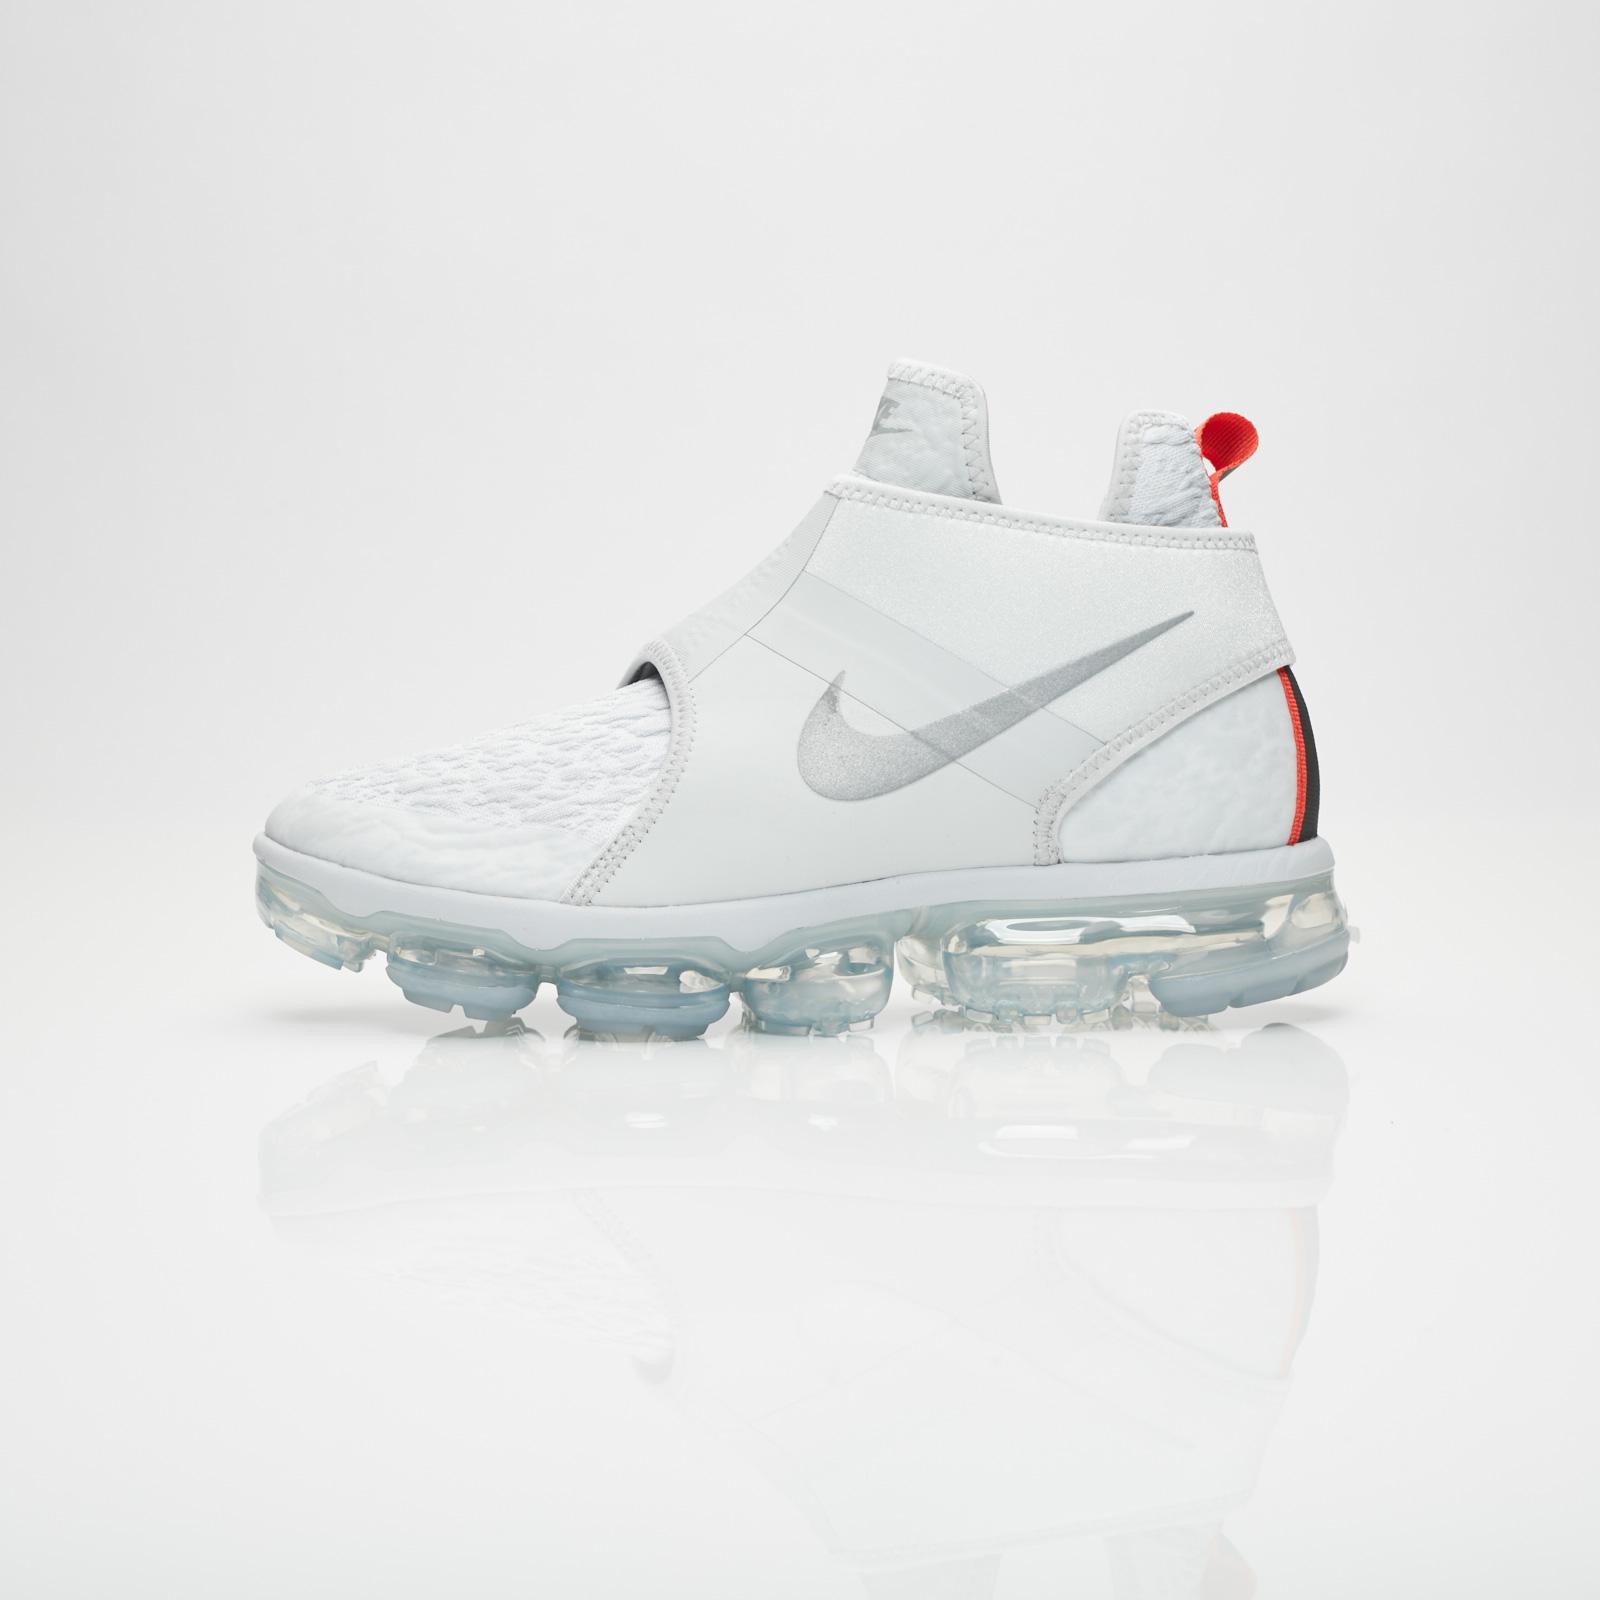 a8eaf74aa1d Nike Nike Air Vapormax Chukka Slip - Ao9326-001 - Sneakersnstuff ...